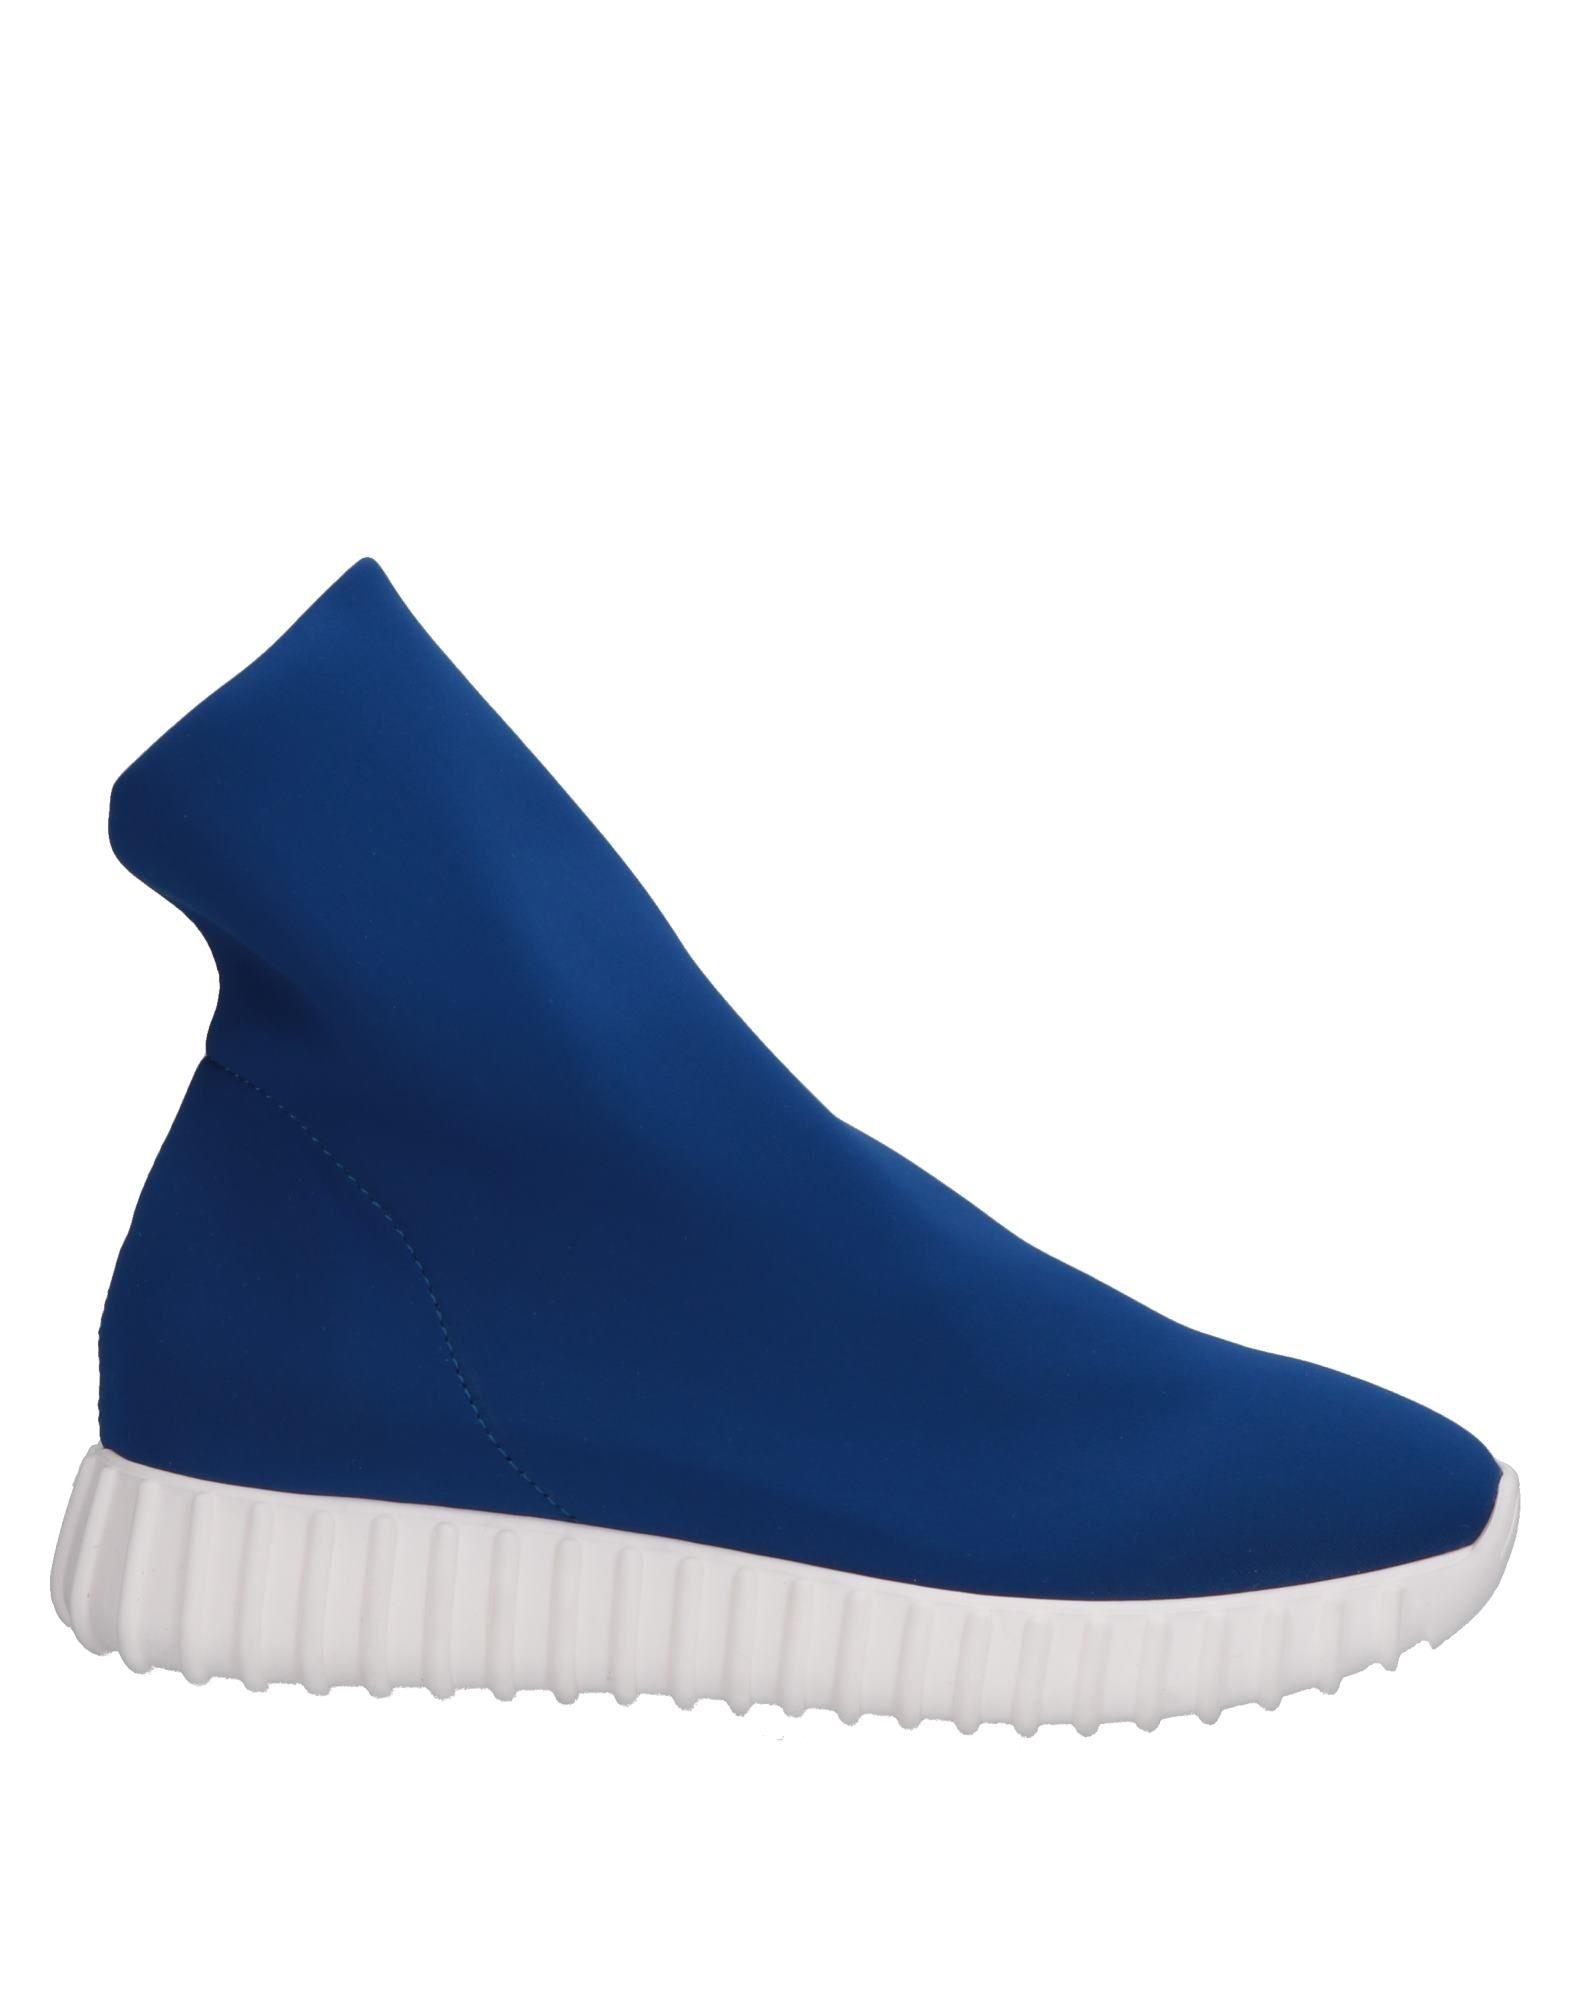 Yoox - Γυναικείες Μπότες-Μποτάκια - Ακριβότερα Προϊόντα - Σελίδα 1122  163e3368972